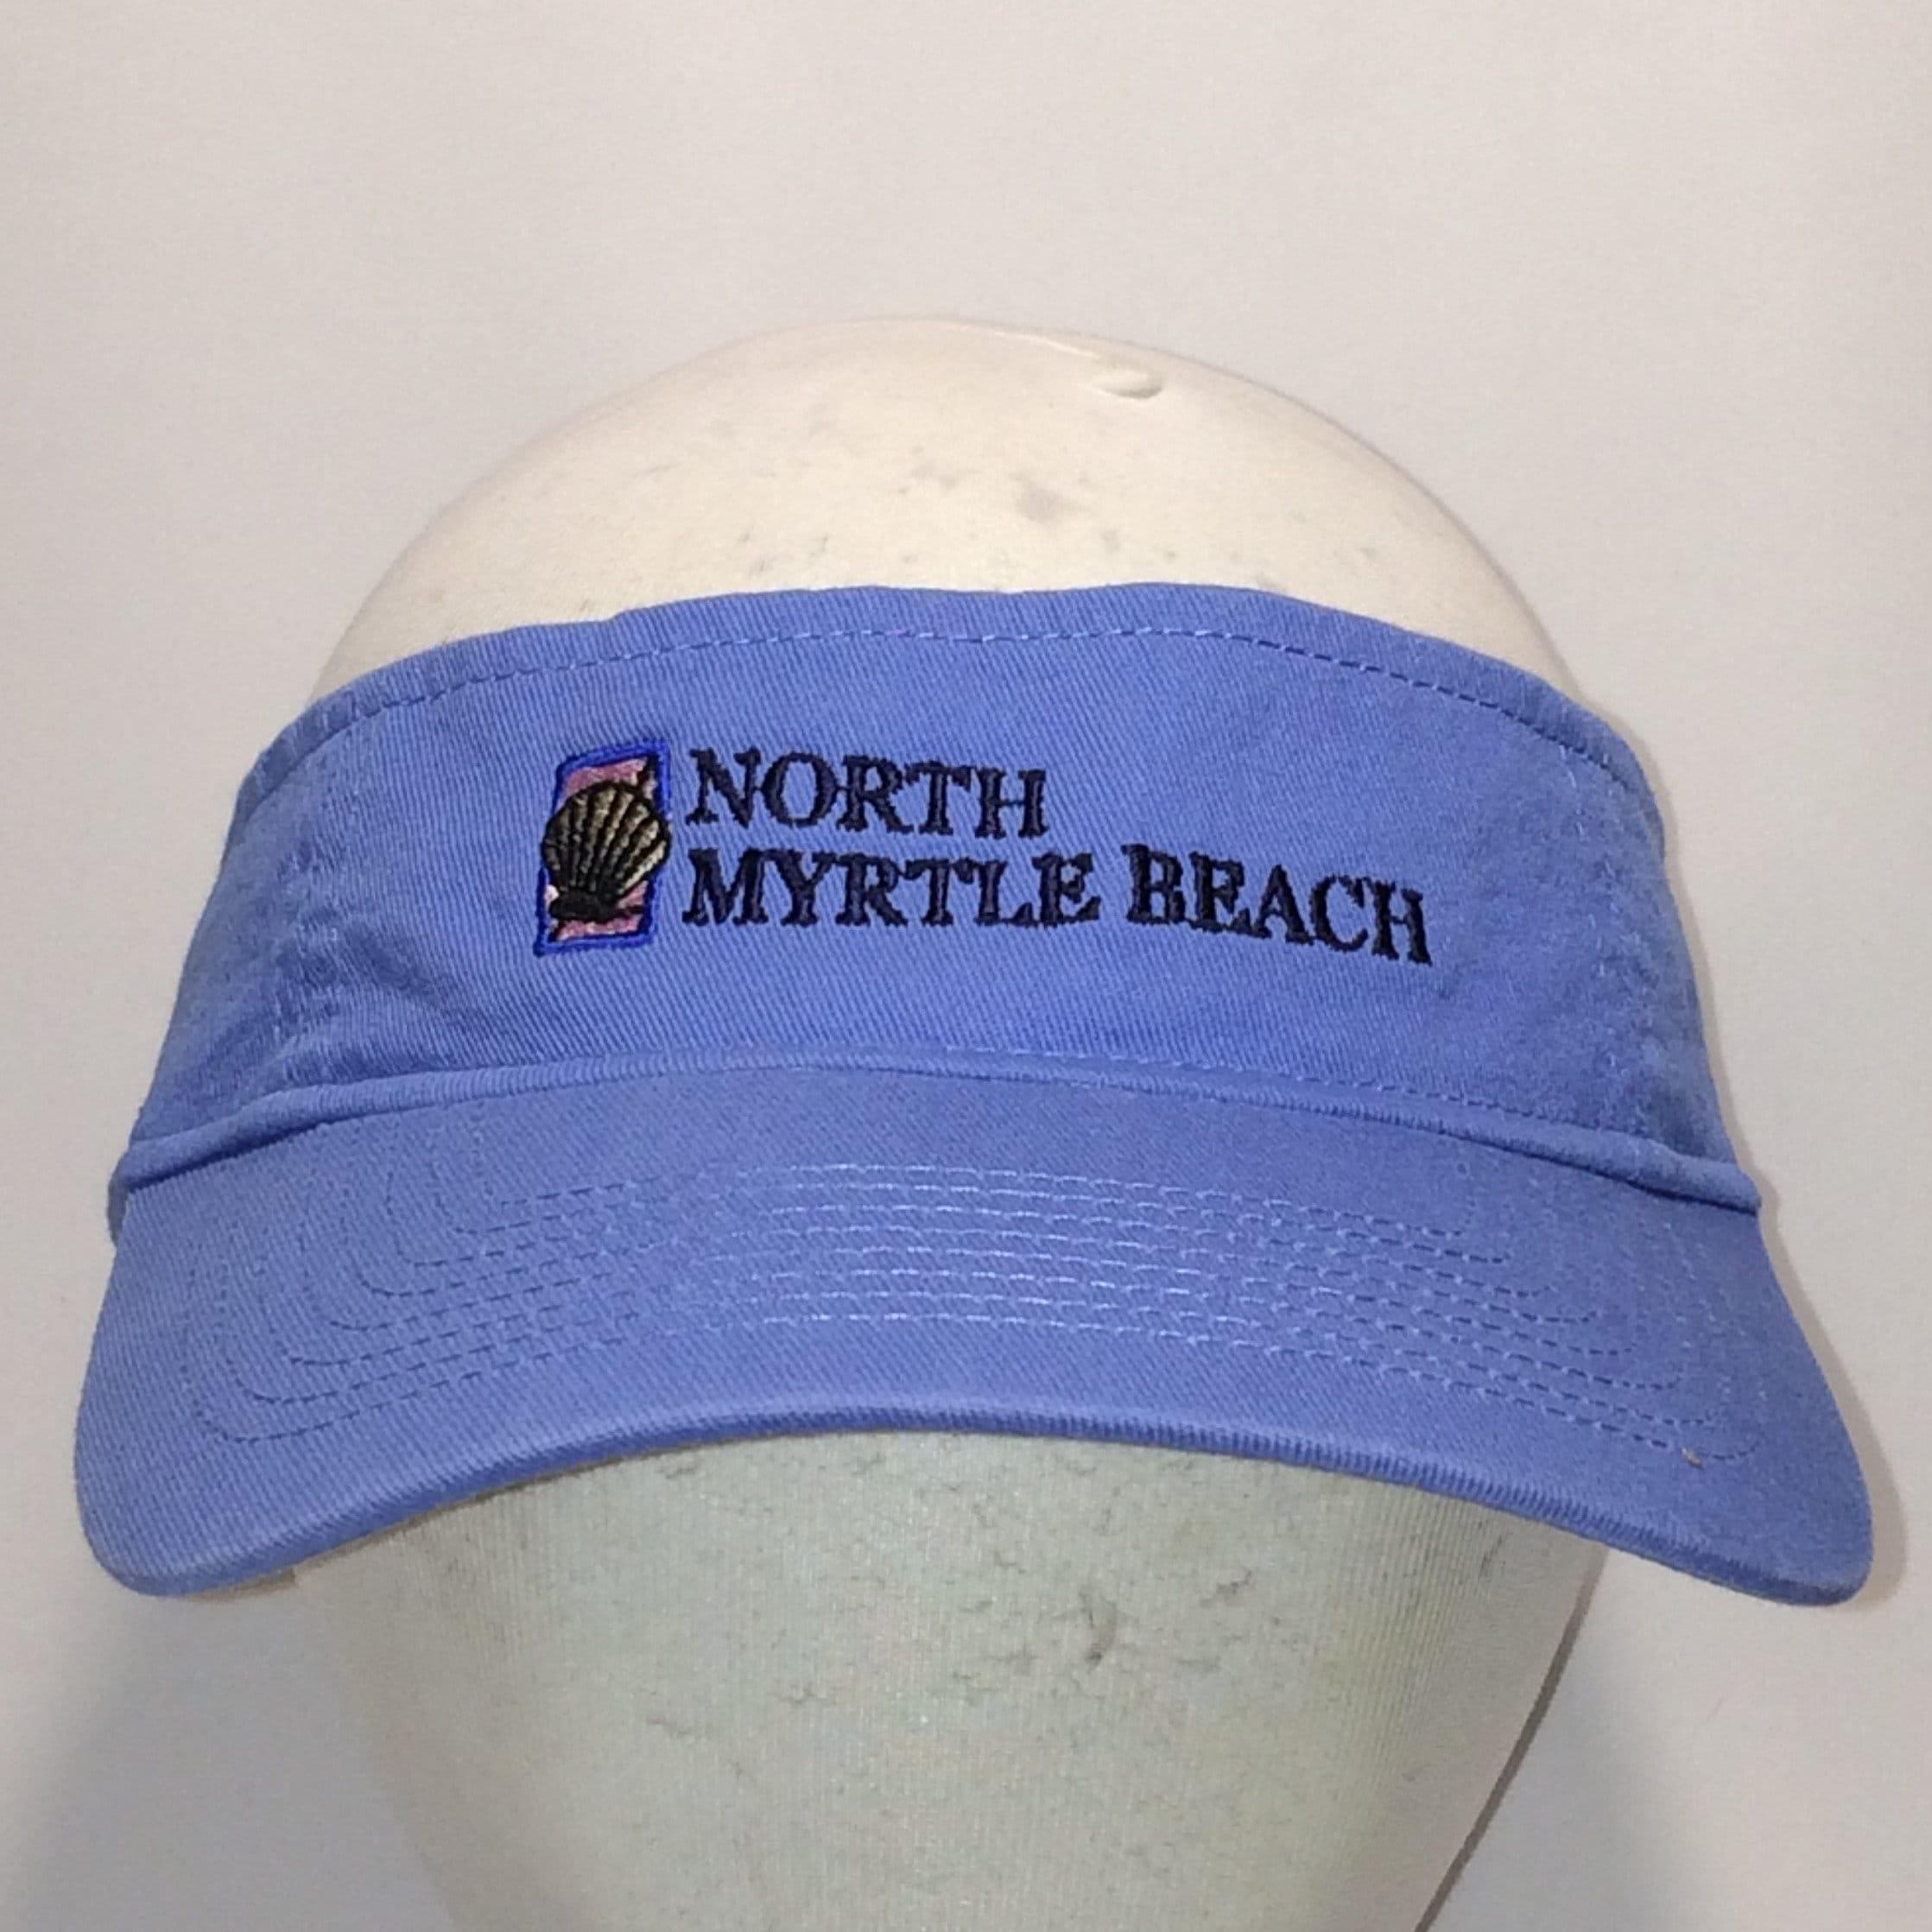 b11f6240181 Vintage Sun Visor Hat Blue Black Pink North Myrtle Beach Hat